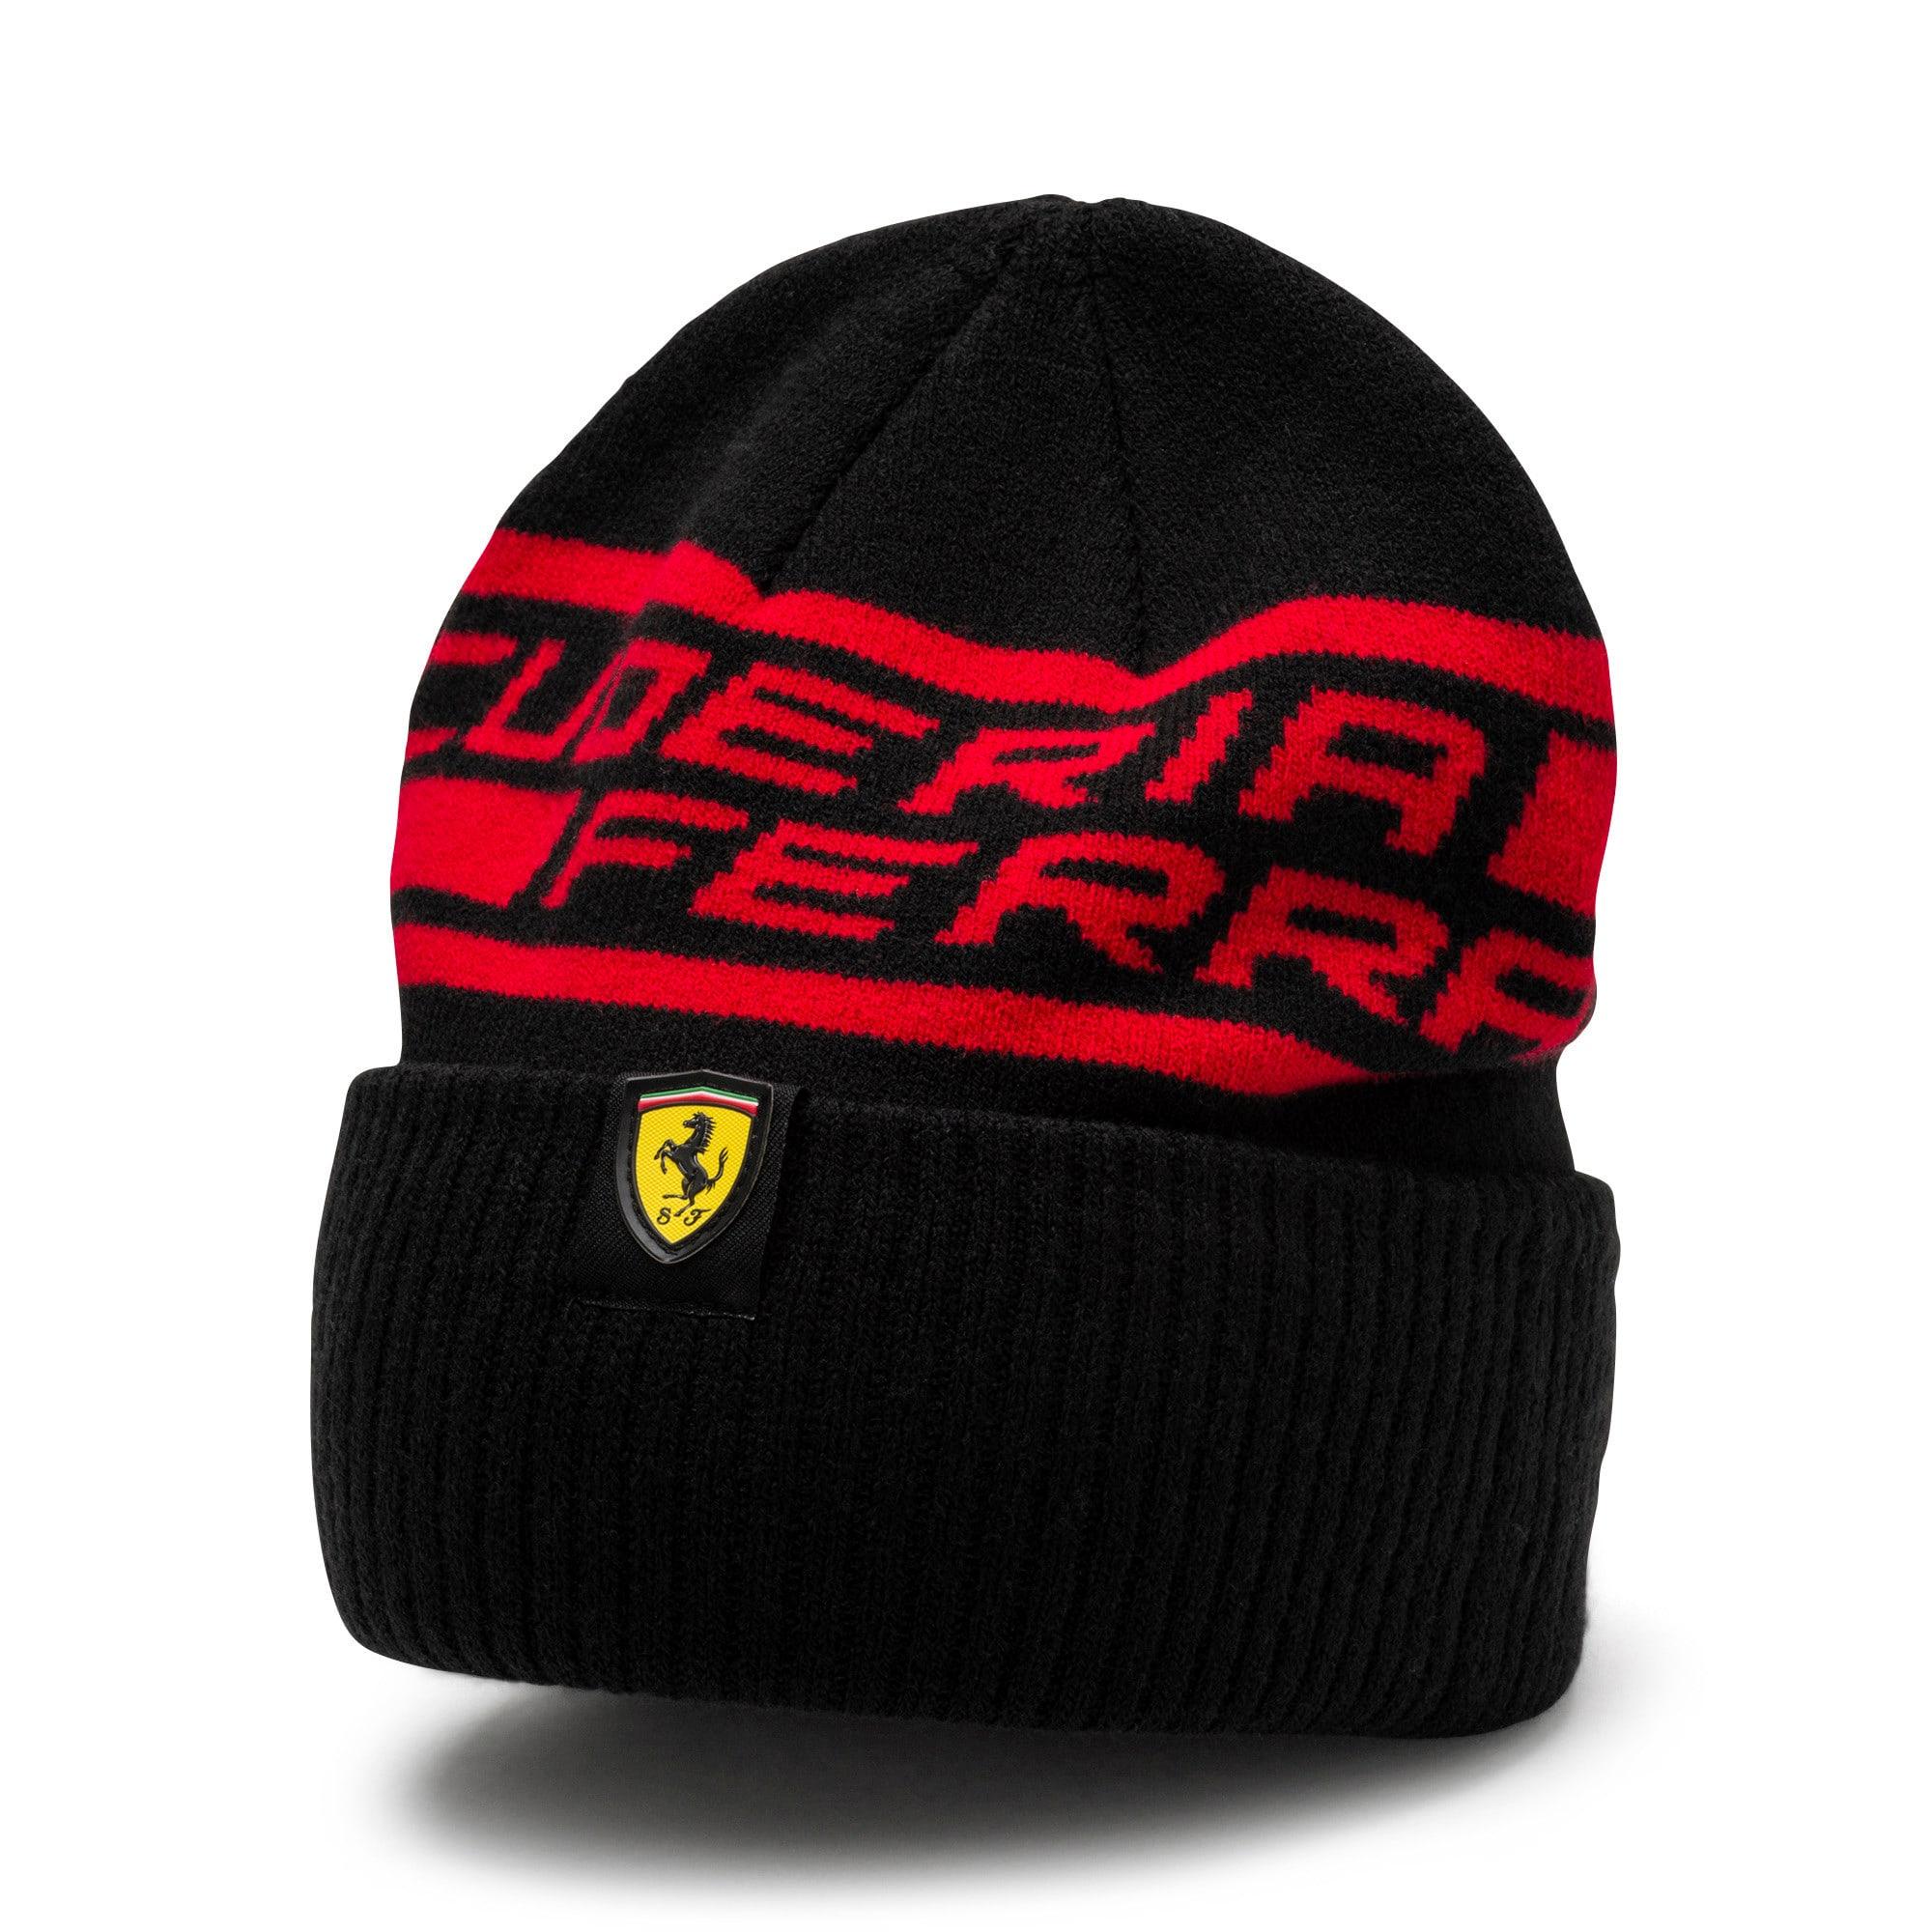 Thumbnail 1 of Scuderia Ferrari Fan Beanie, Puma Black, medium